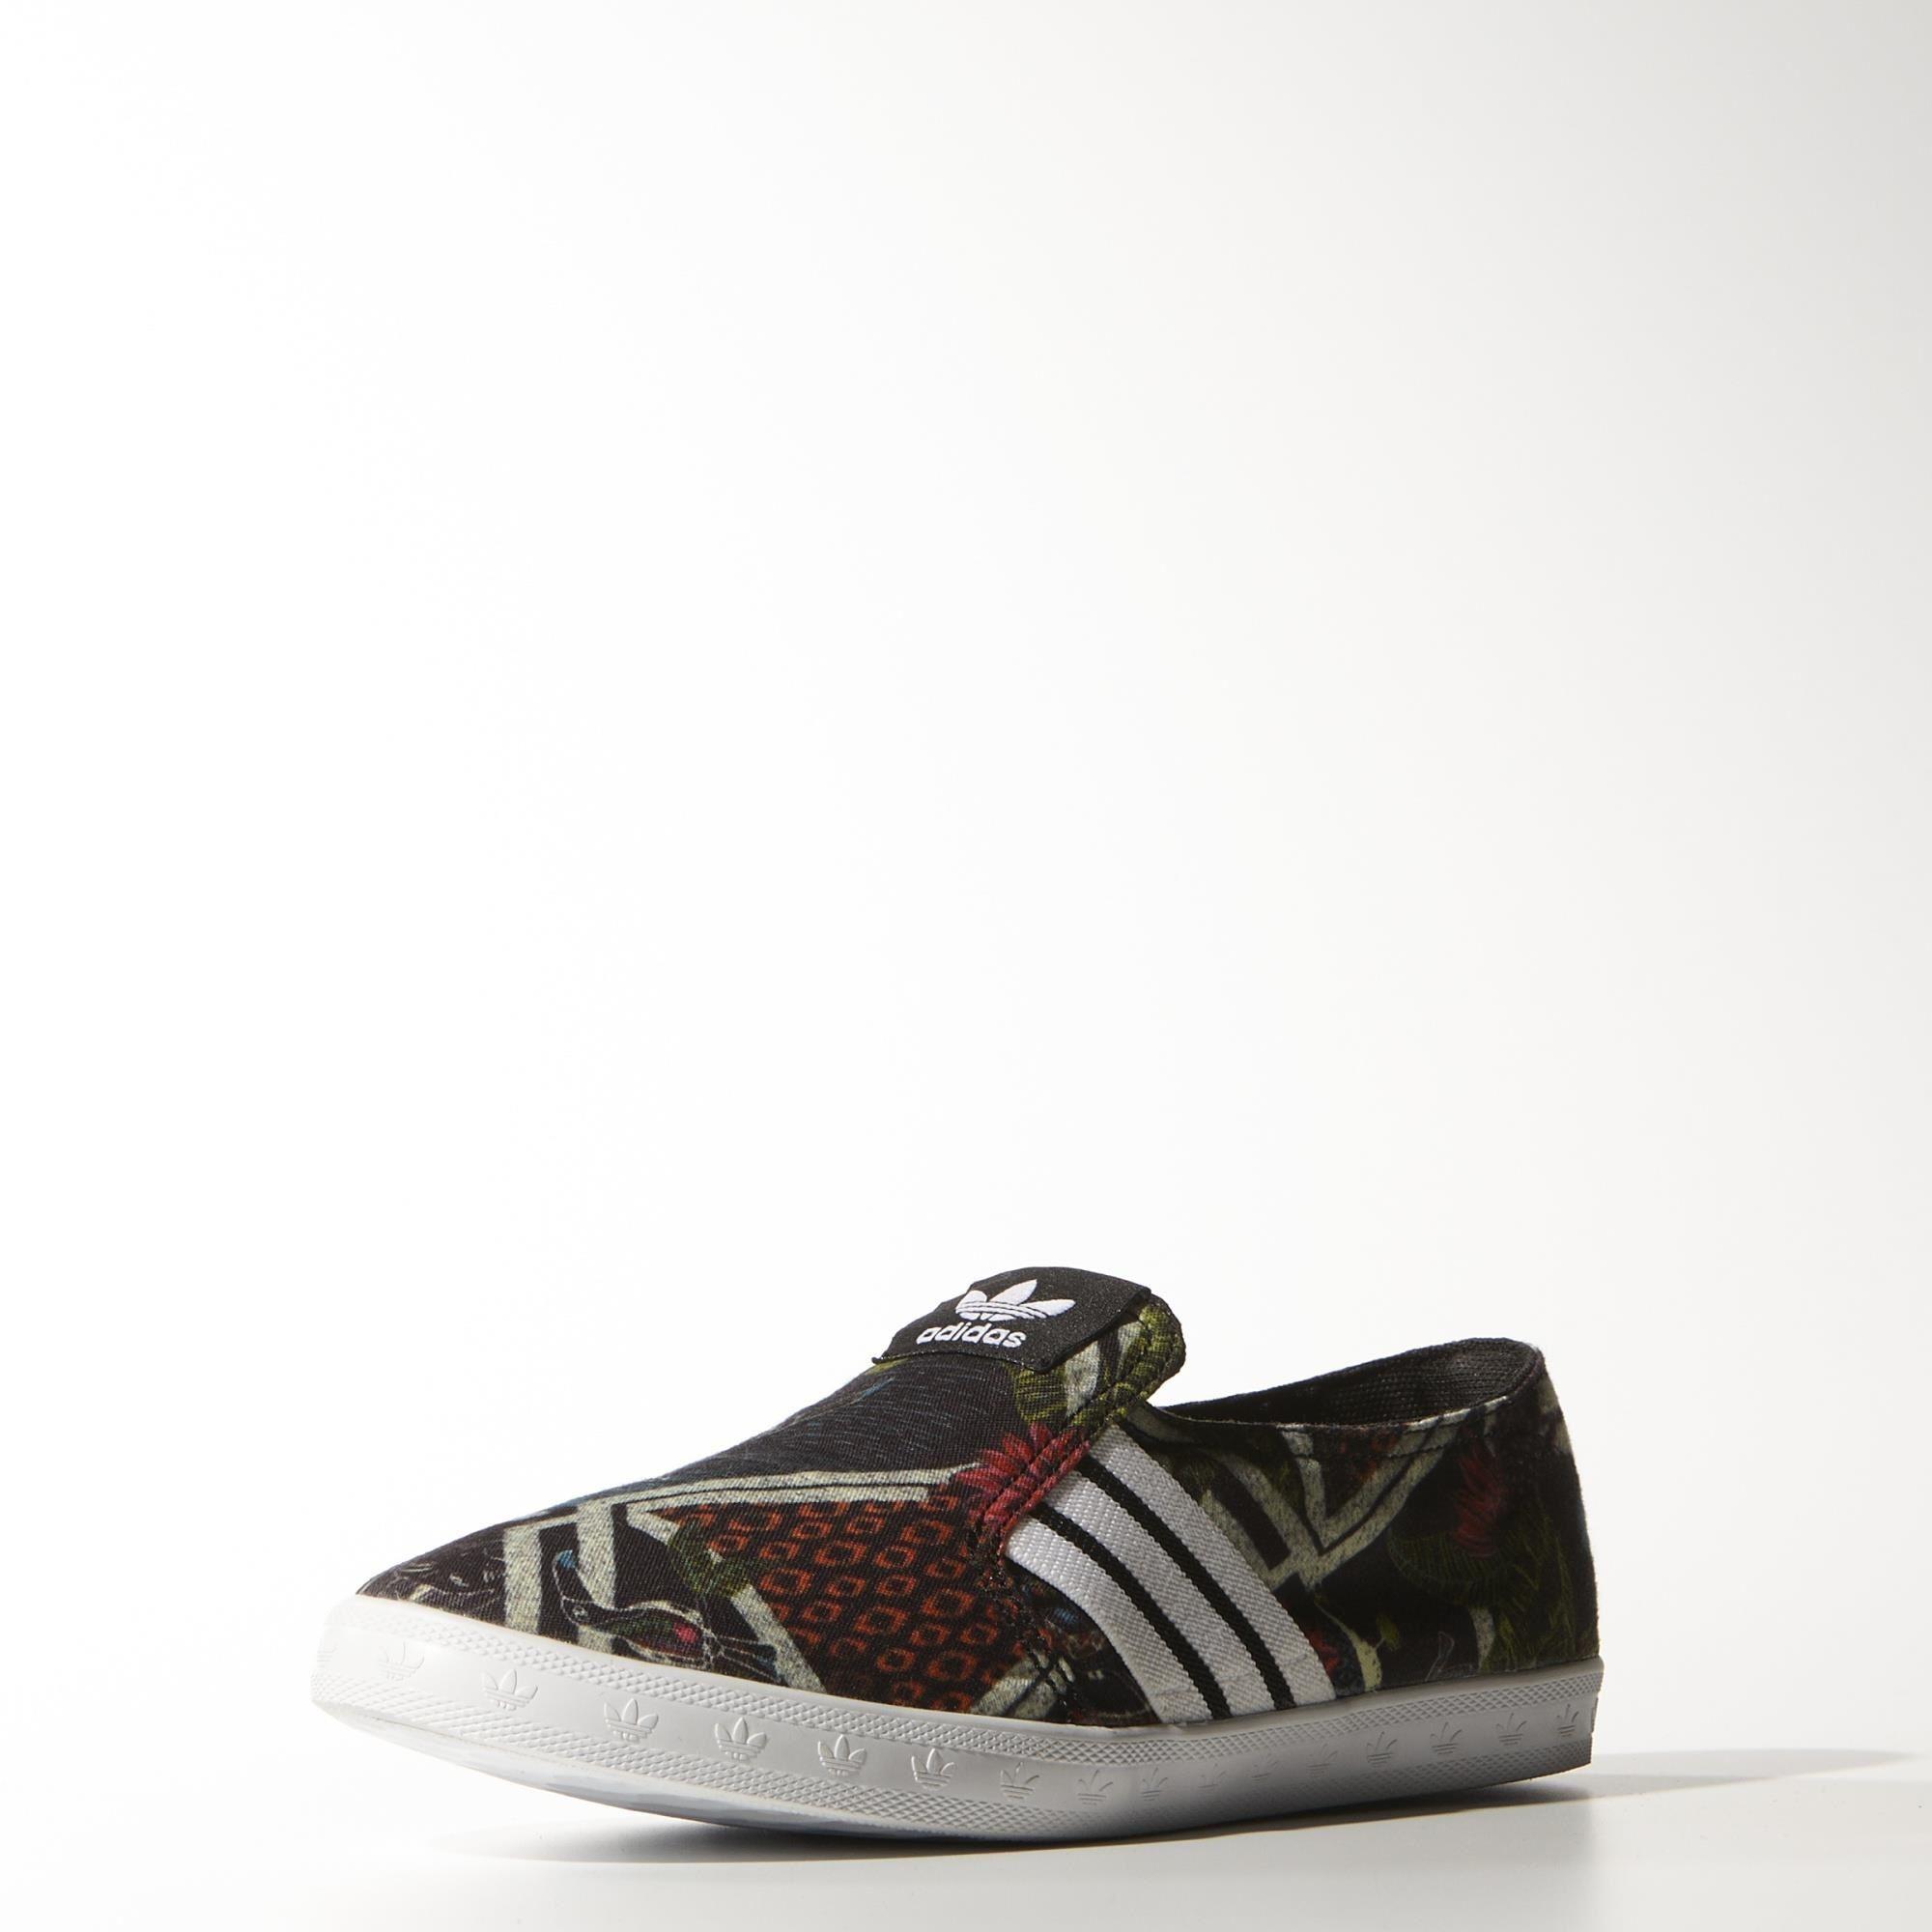 adidas Women's Adria PS Slip-On Shoes - Black